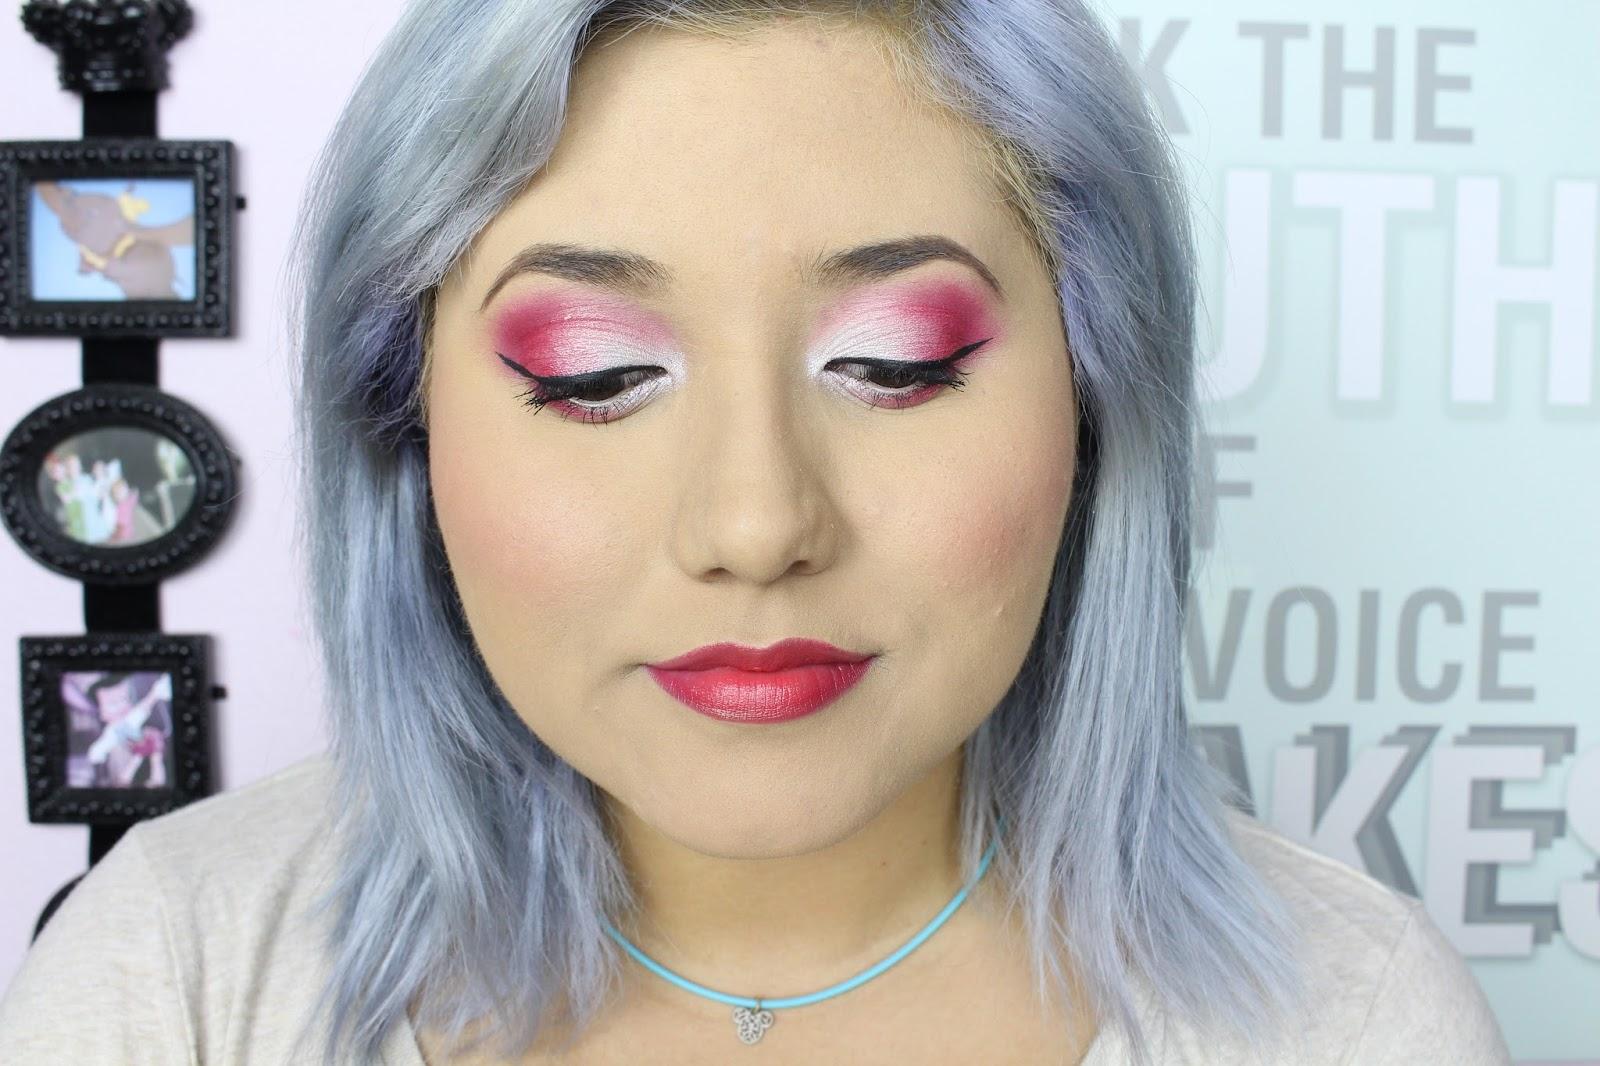 carolcarol92: DISNEY: Lilo and Stitch 'Lilo' INSPIRED Makeup